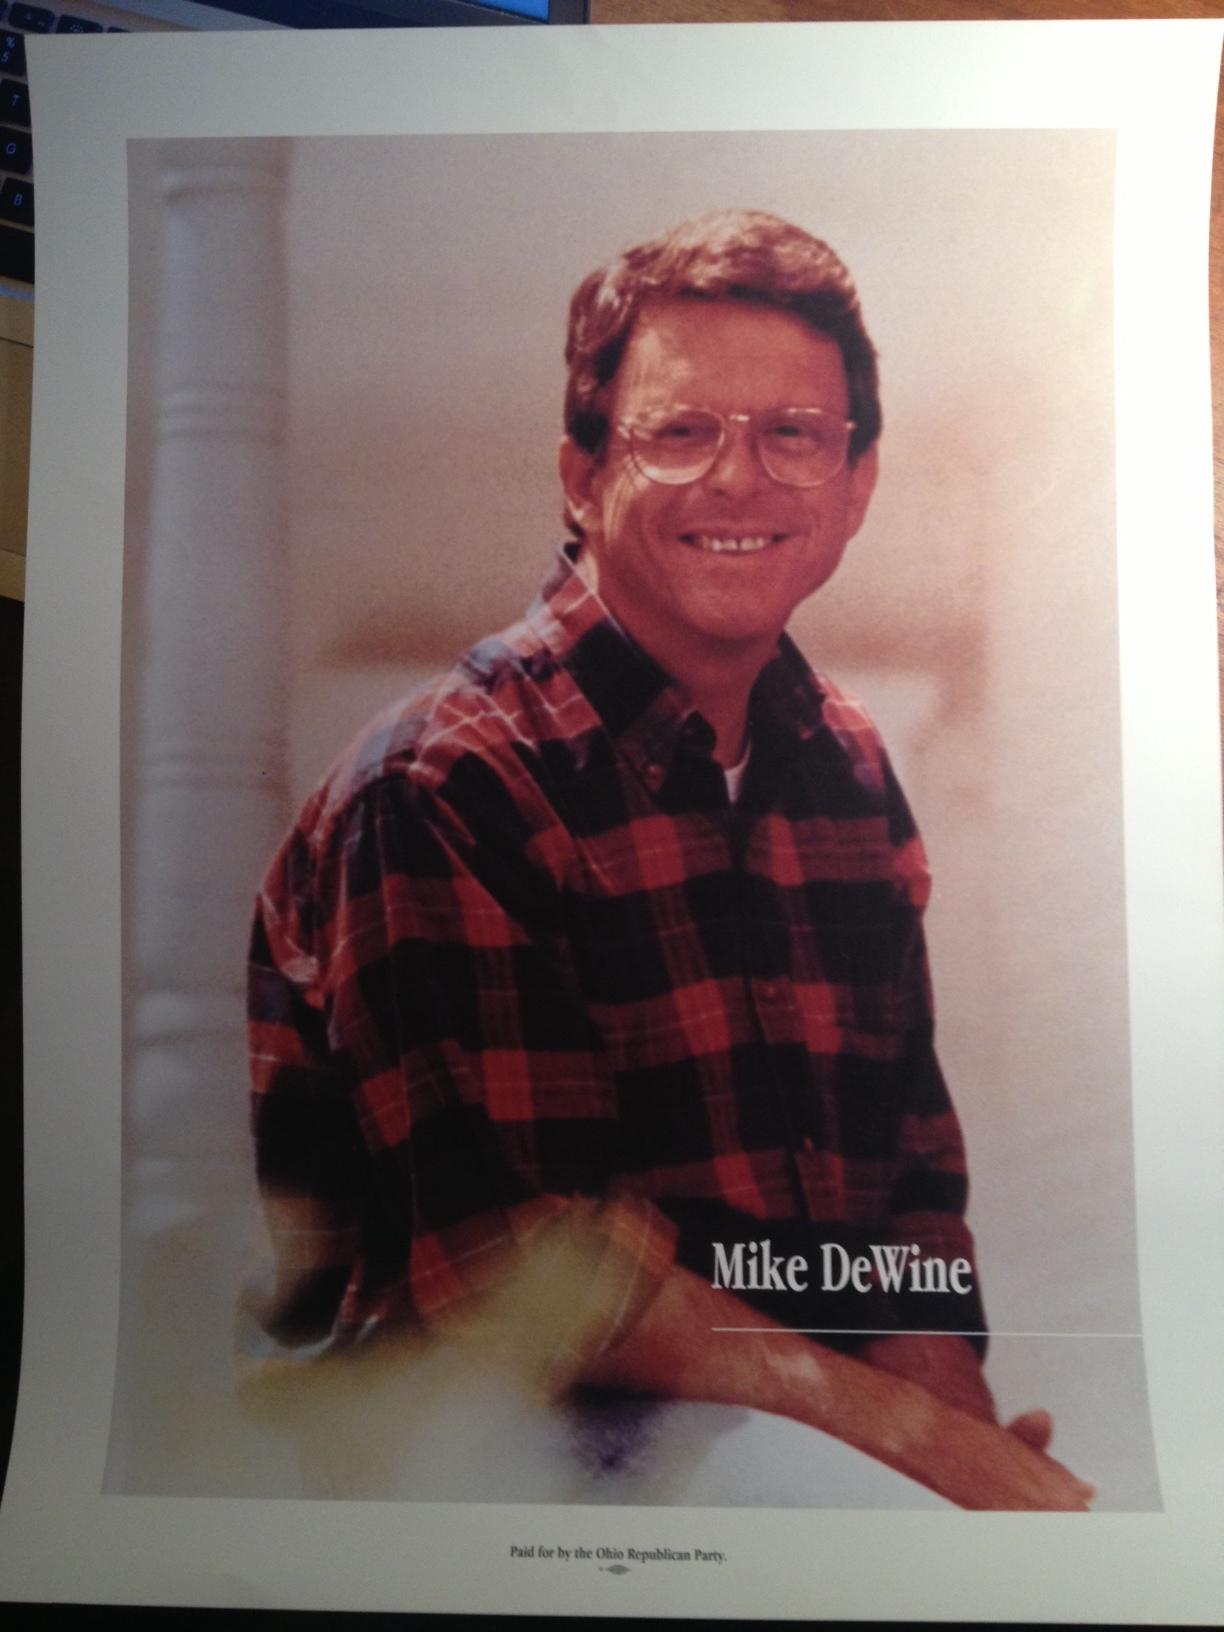 Poster OH-1992 DeWINE copy.JPG